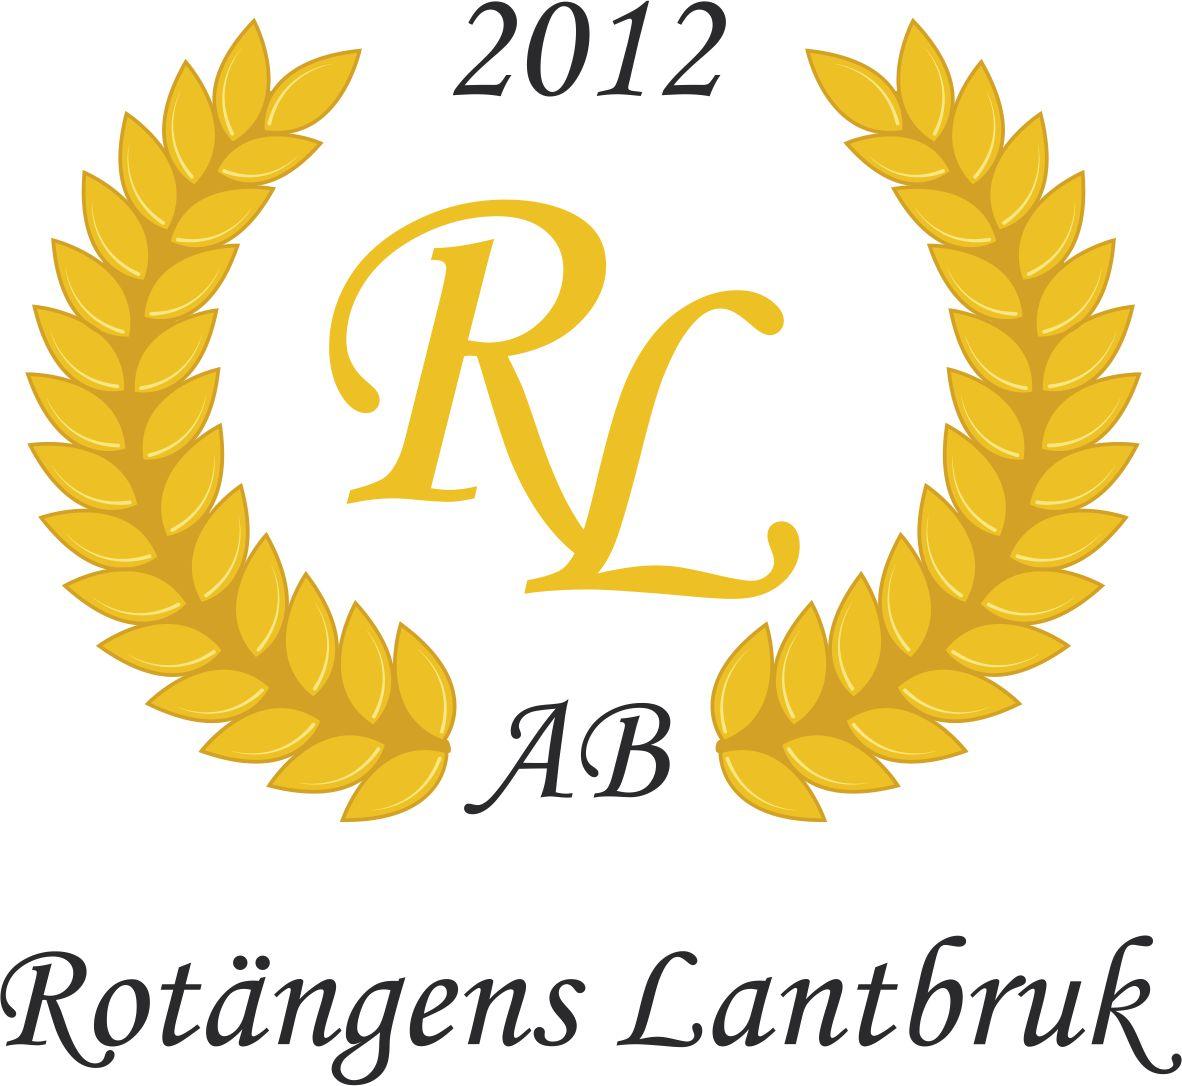 Rotängens Lantbruk AB